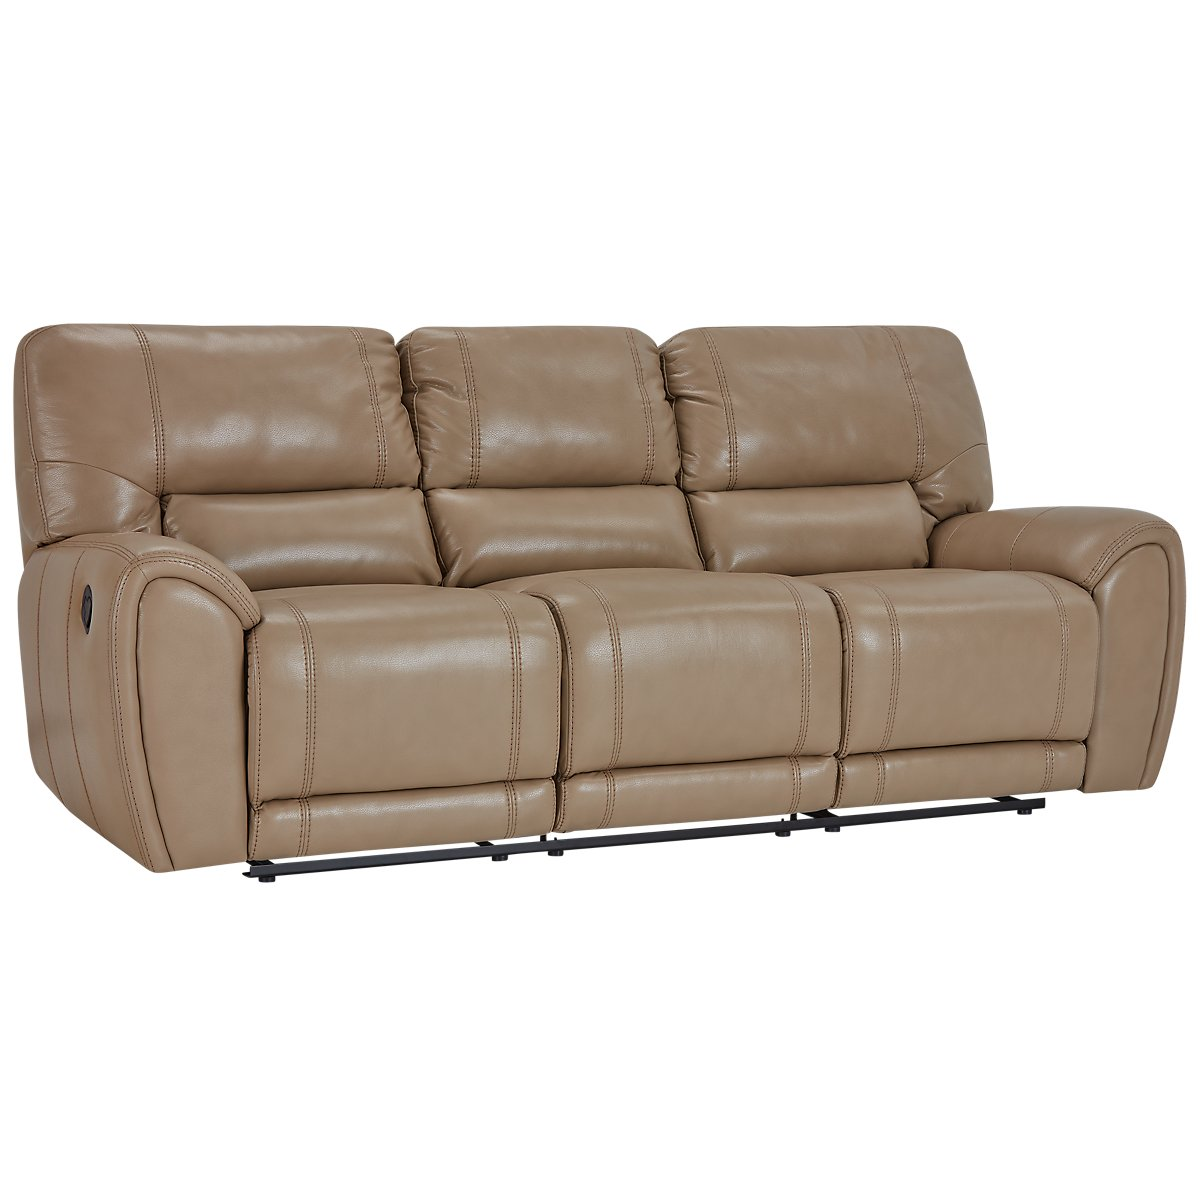 Bailey Taupe Microfiber Reclining Sofa